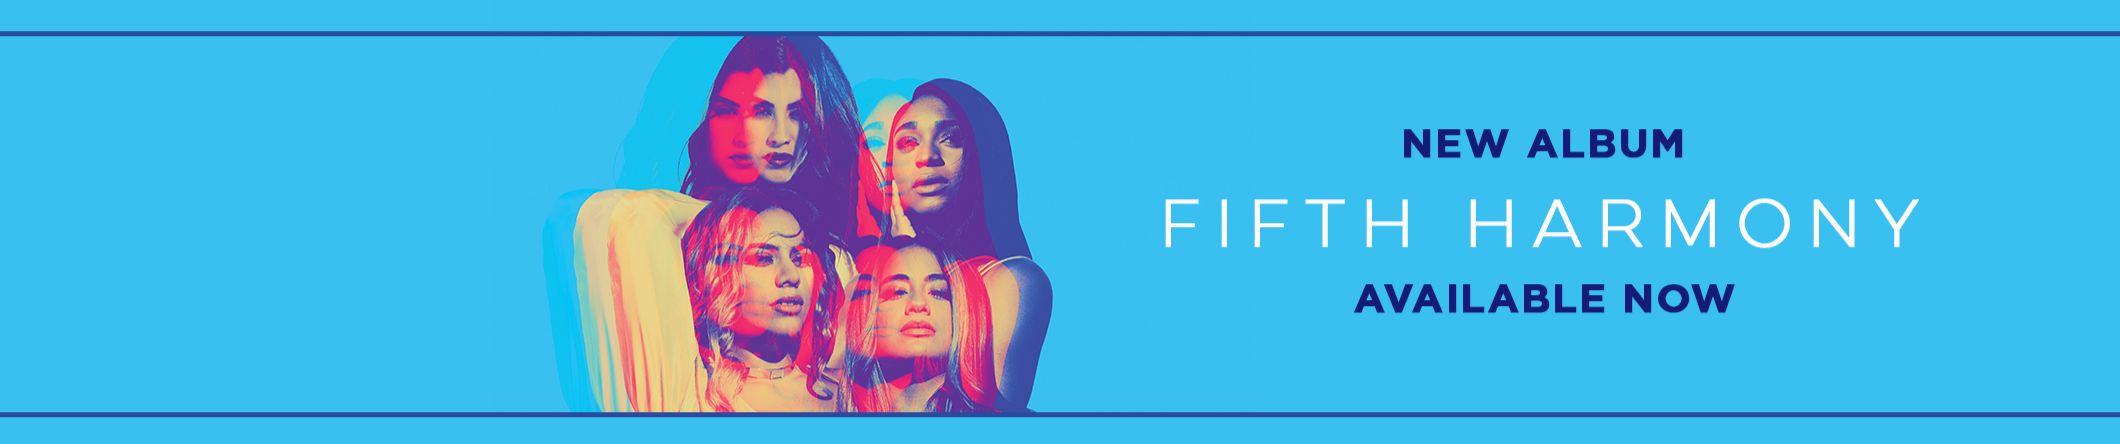 FifthHarmony | Fifth Harmony | Free Listening on SoundCloud